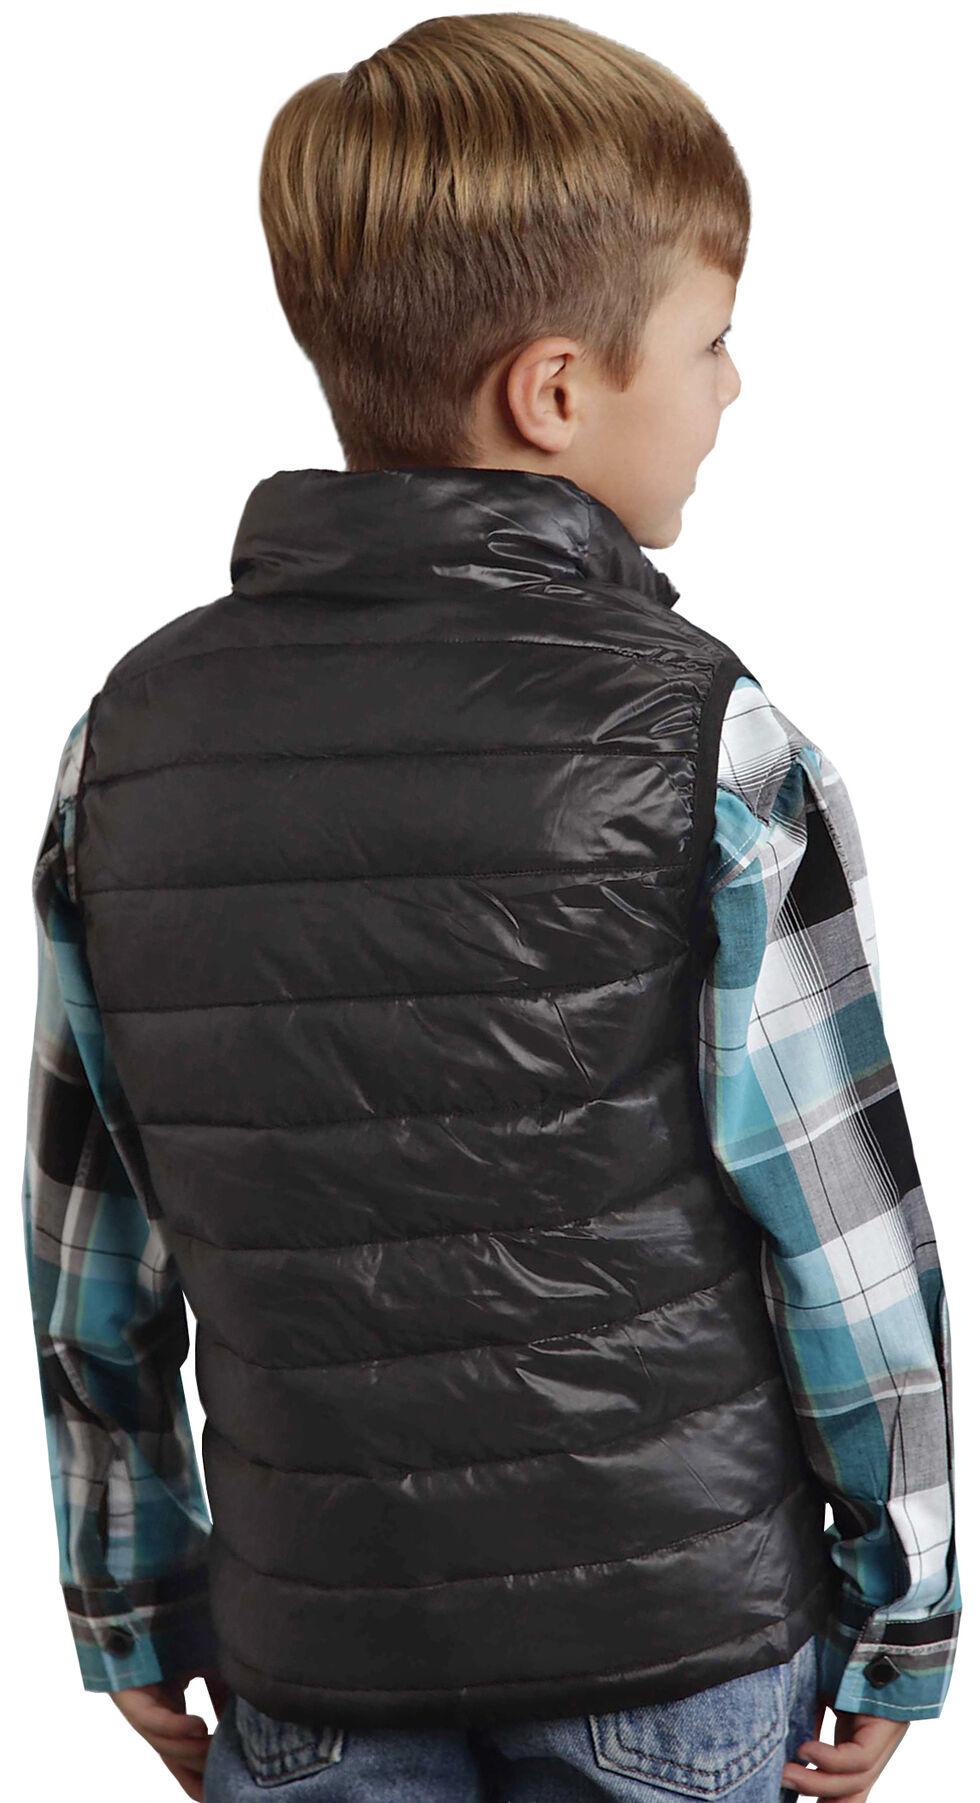 Roper Boy's Rangegear Crushable Black Vest, Black, hi-res